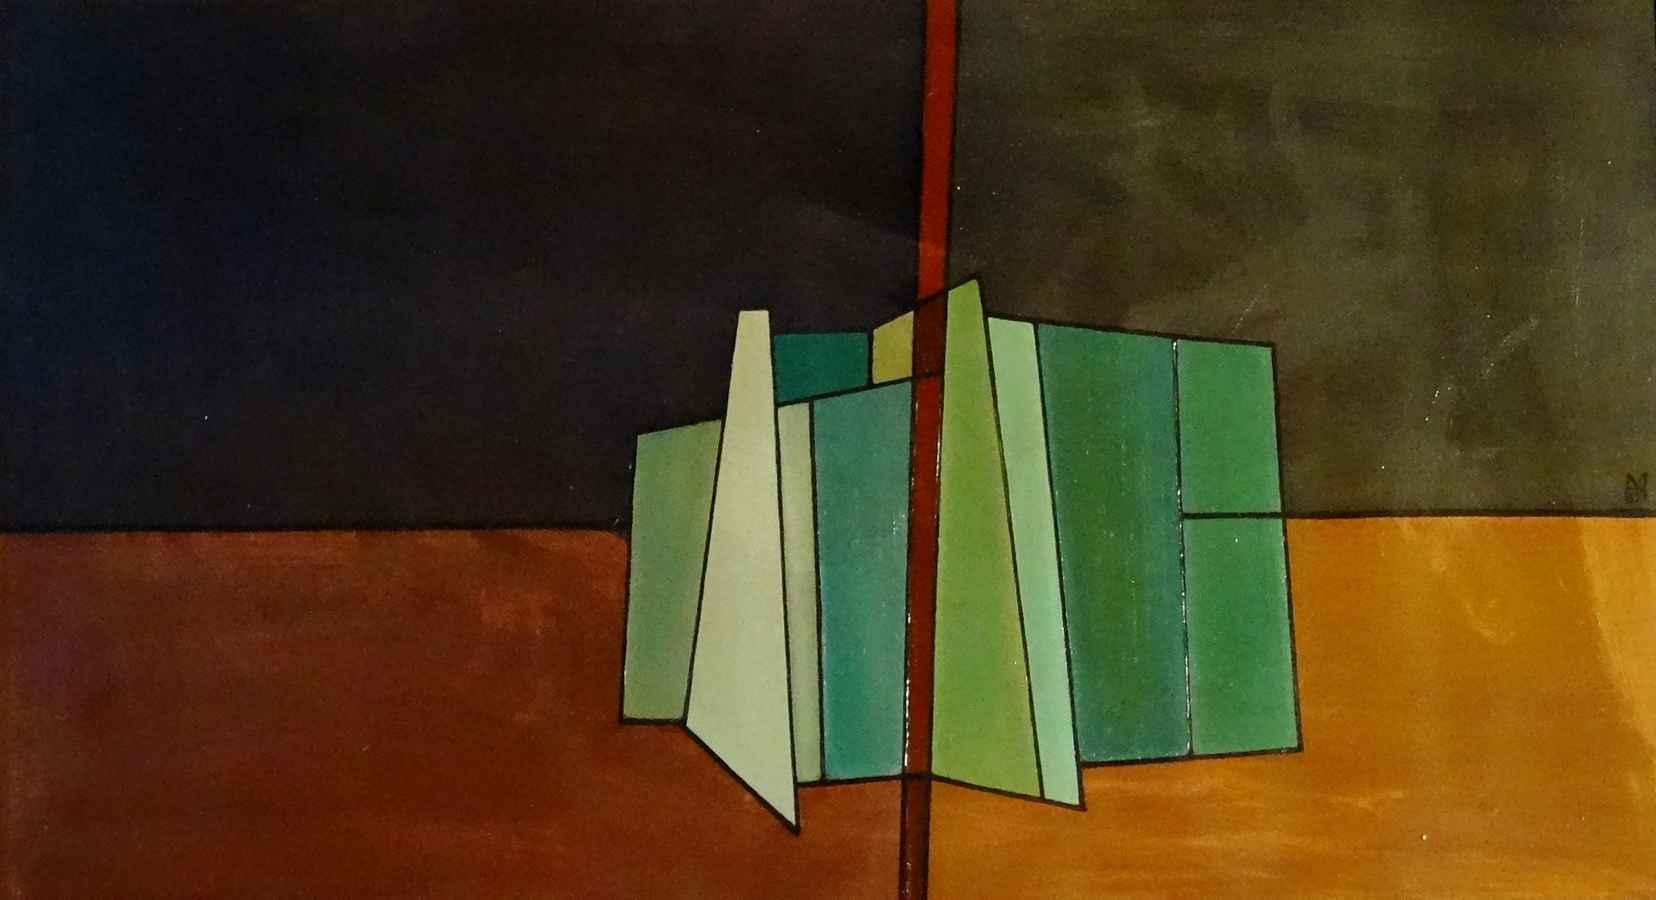 Karsch Manfred alkotása, 1987